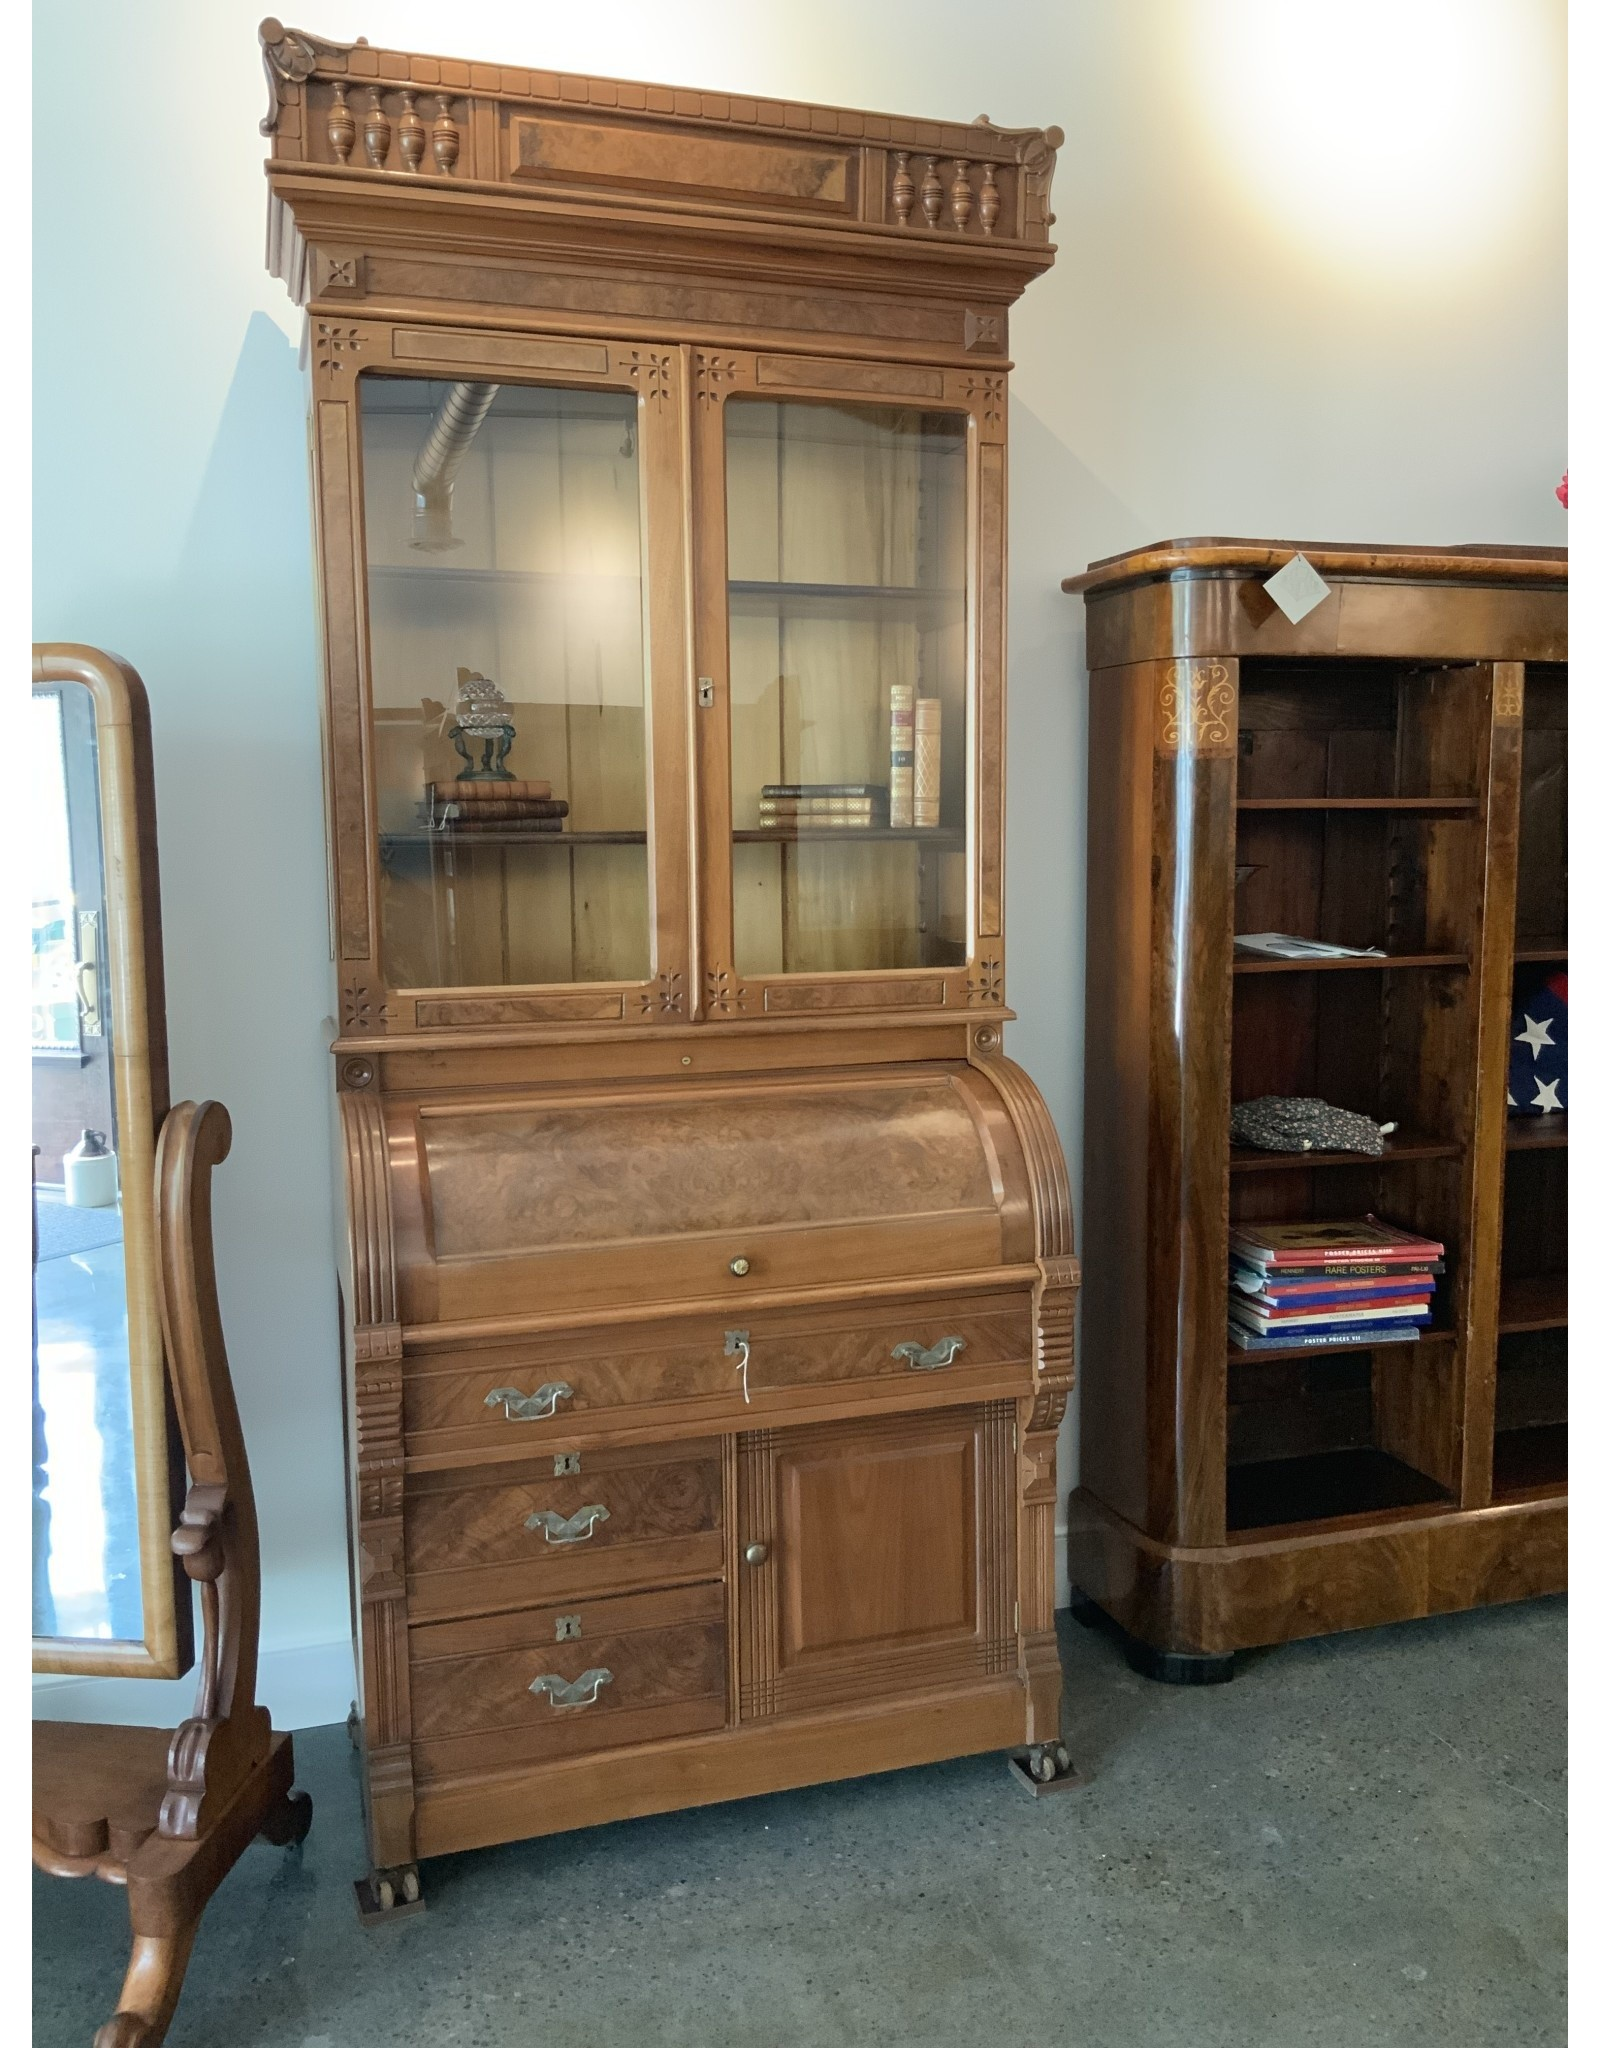 SPV Victorian Eastlake 1885 cylinder roll top secretary desk and bookcase